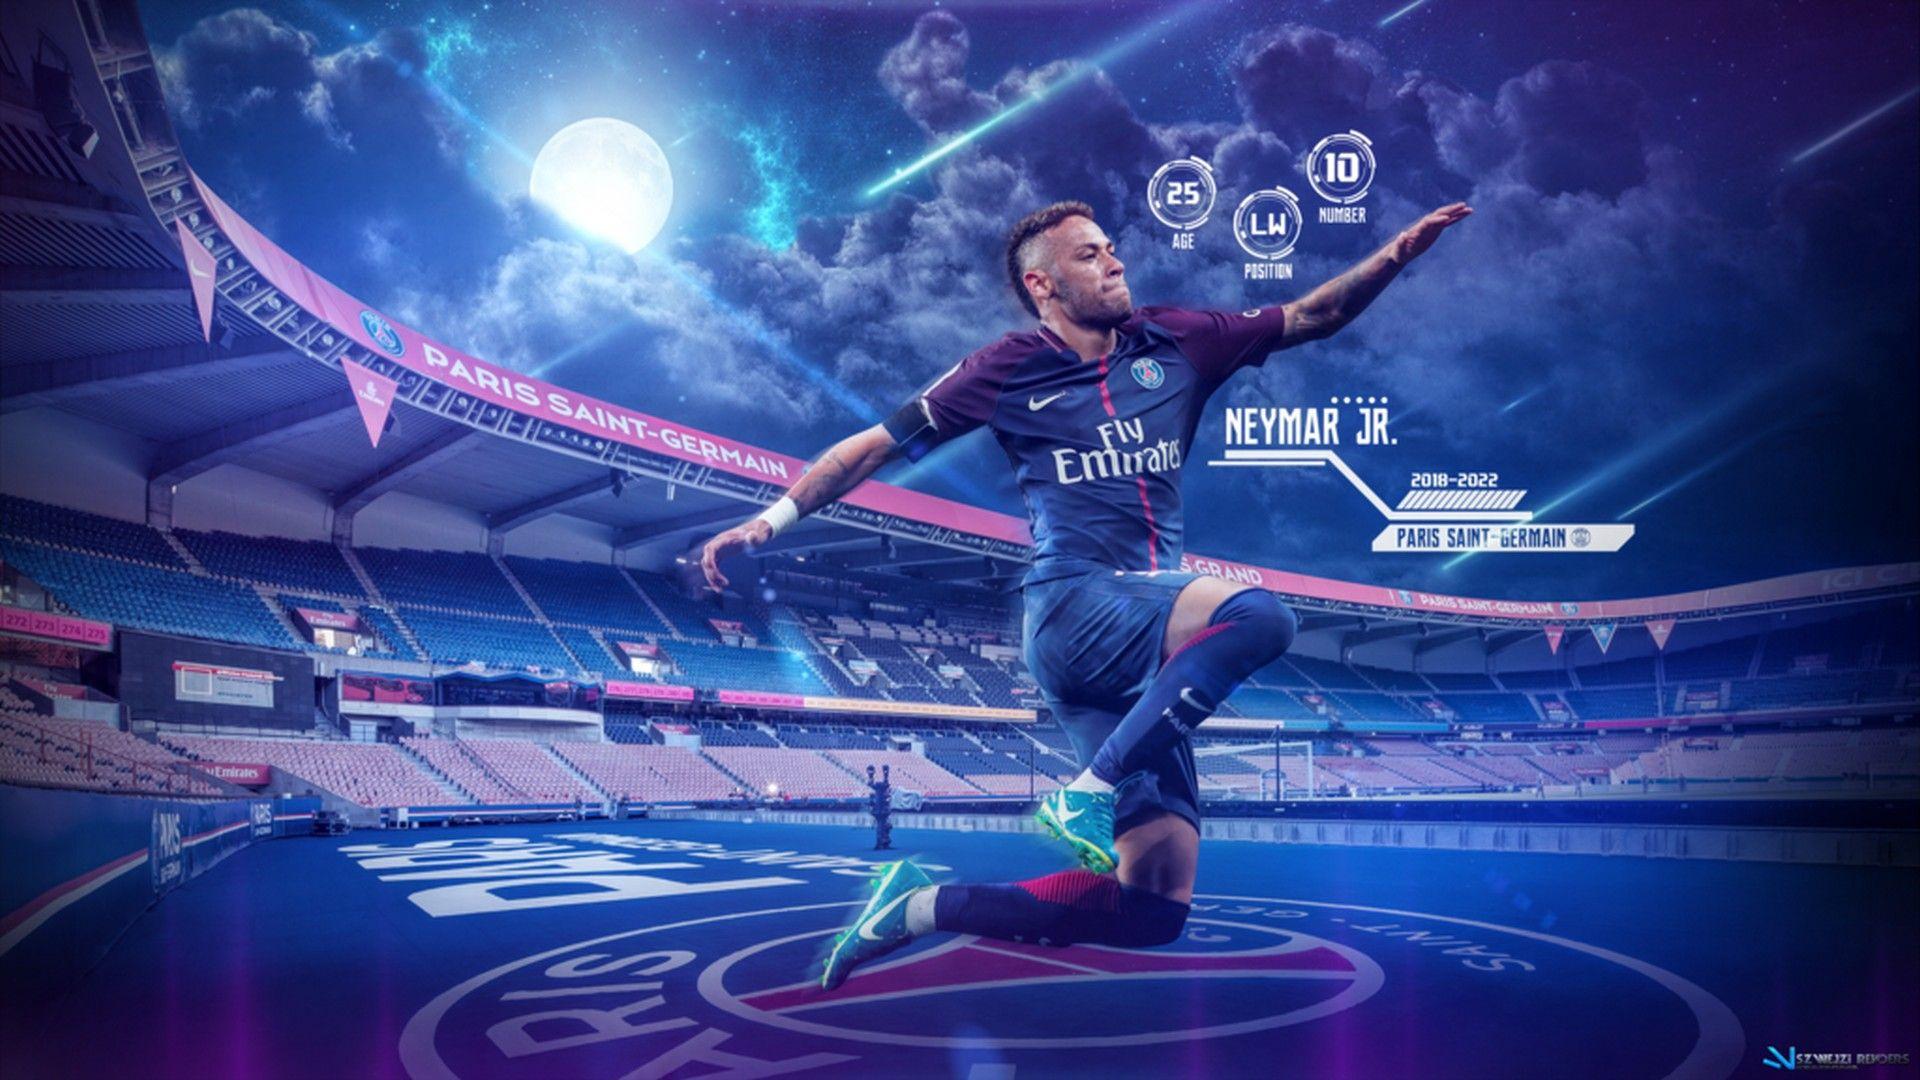 720a897077 Neymar PSG HD Wallpaper - Best Wallpaper HD